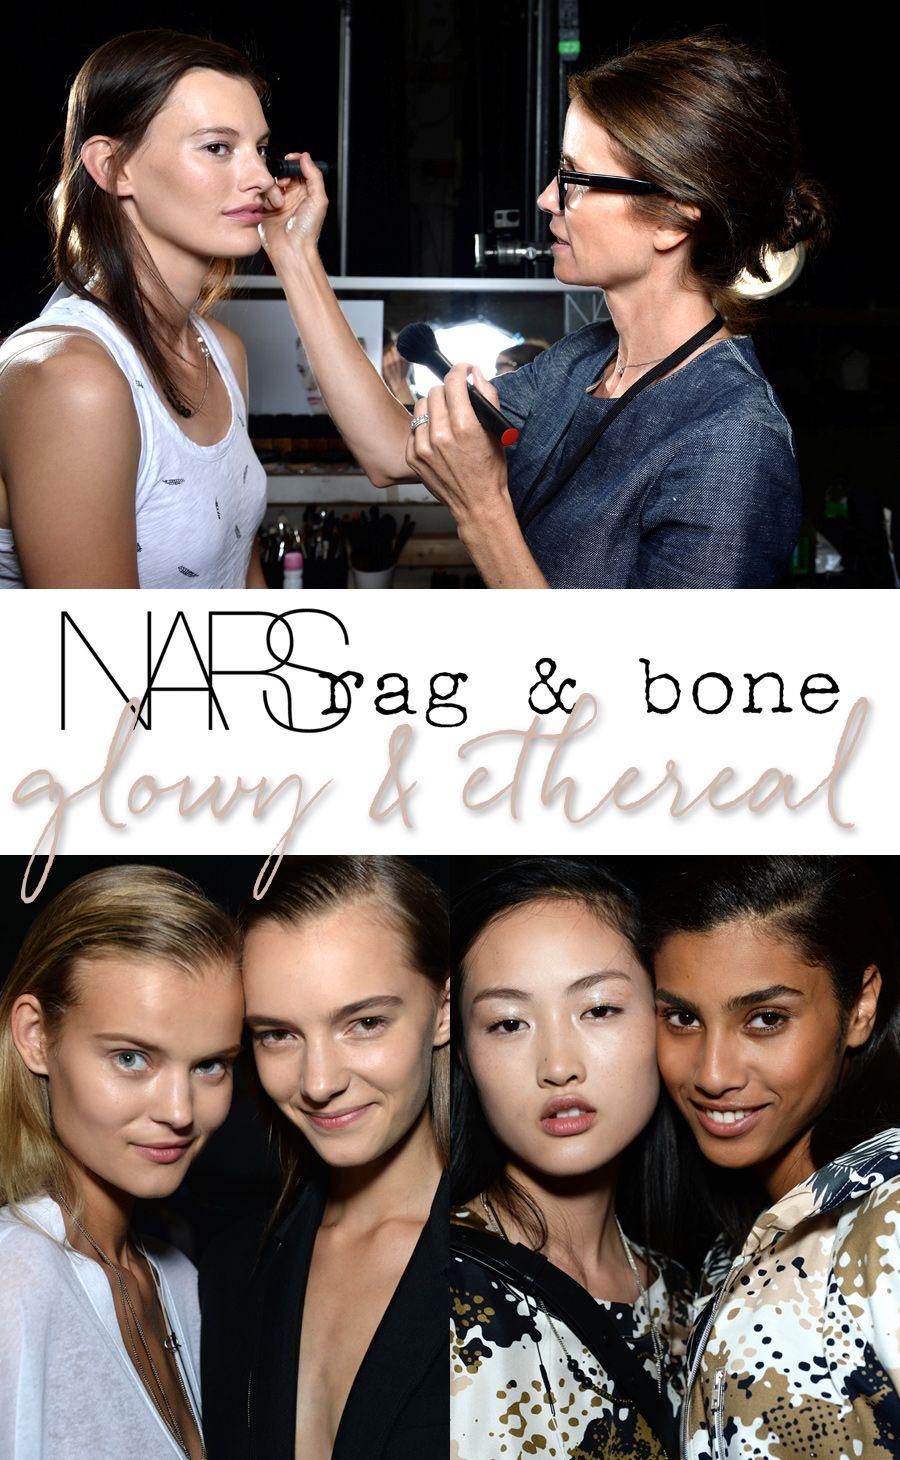 Get the Look NARS at Rag & Bone Spring/Summer 2015 Glowy